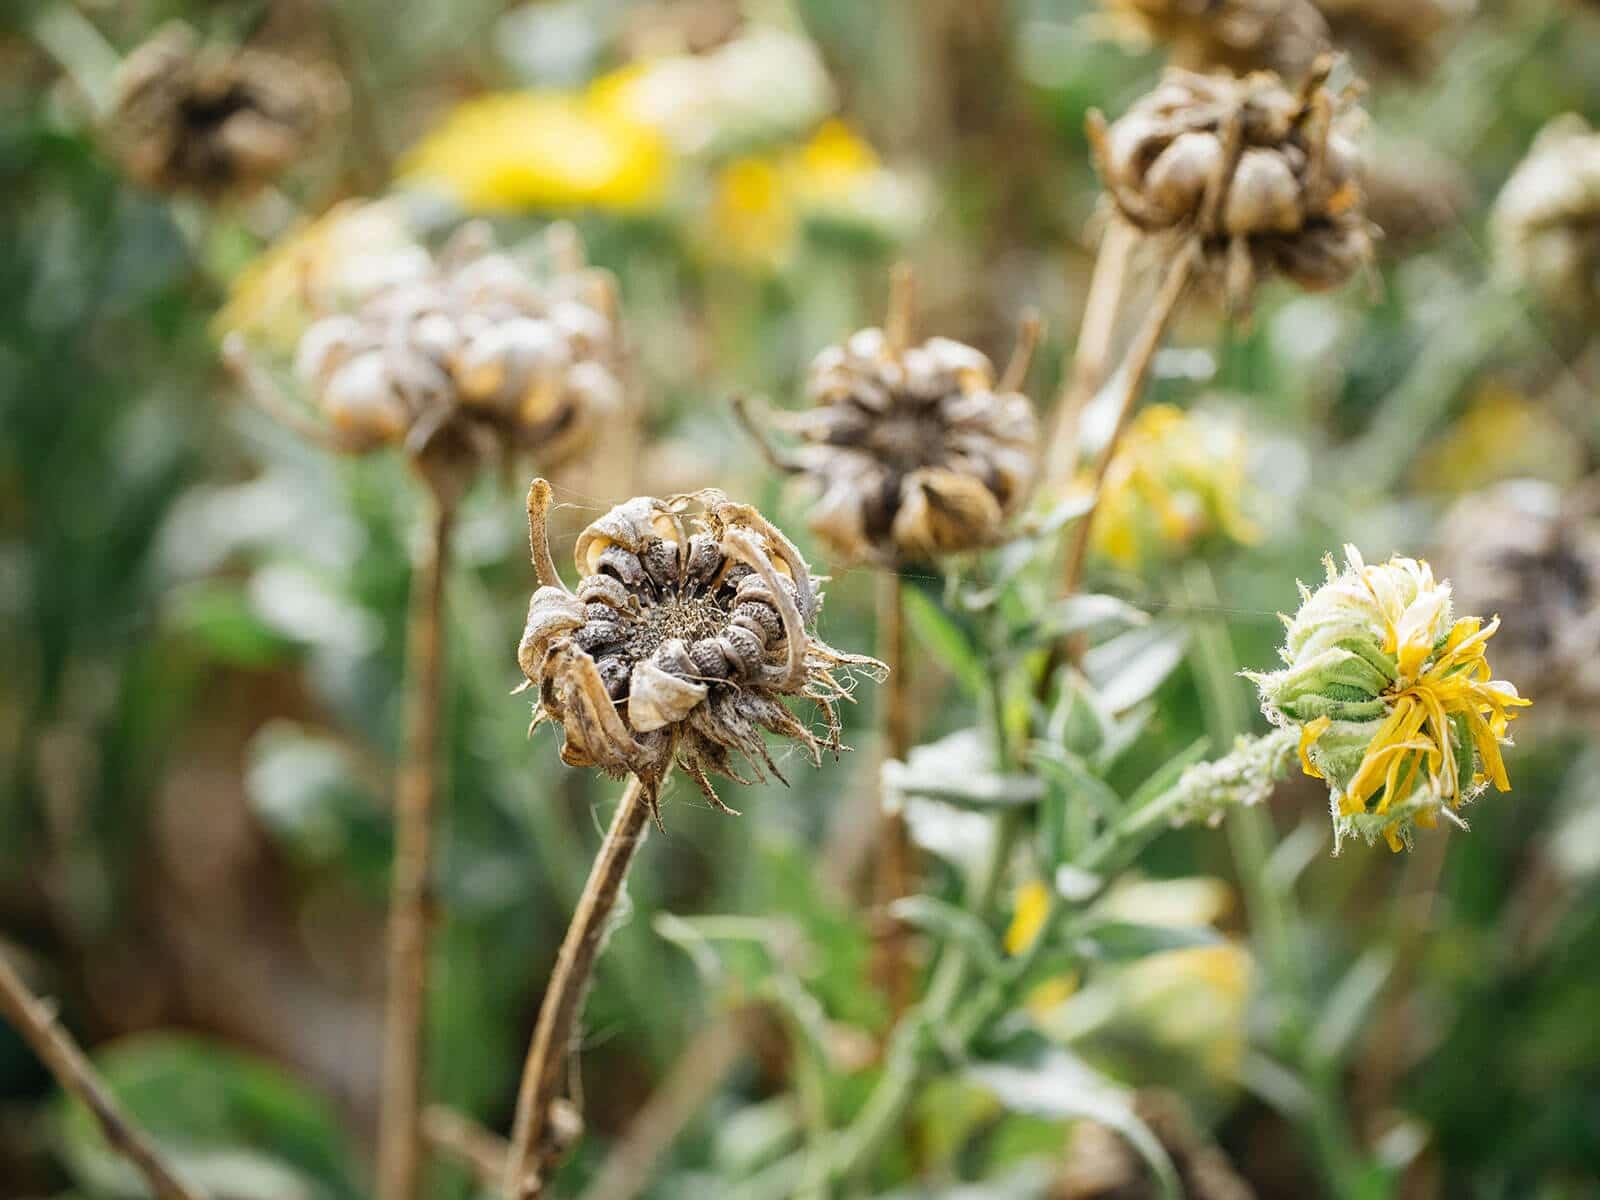 Close up of seedhead on dried calendula flower